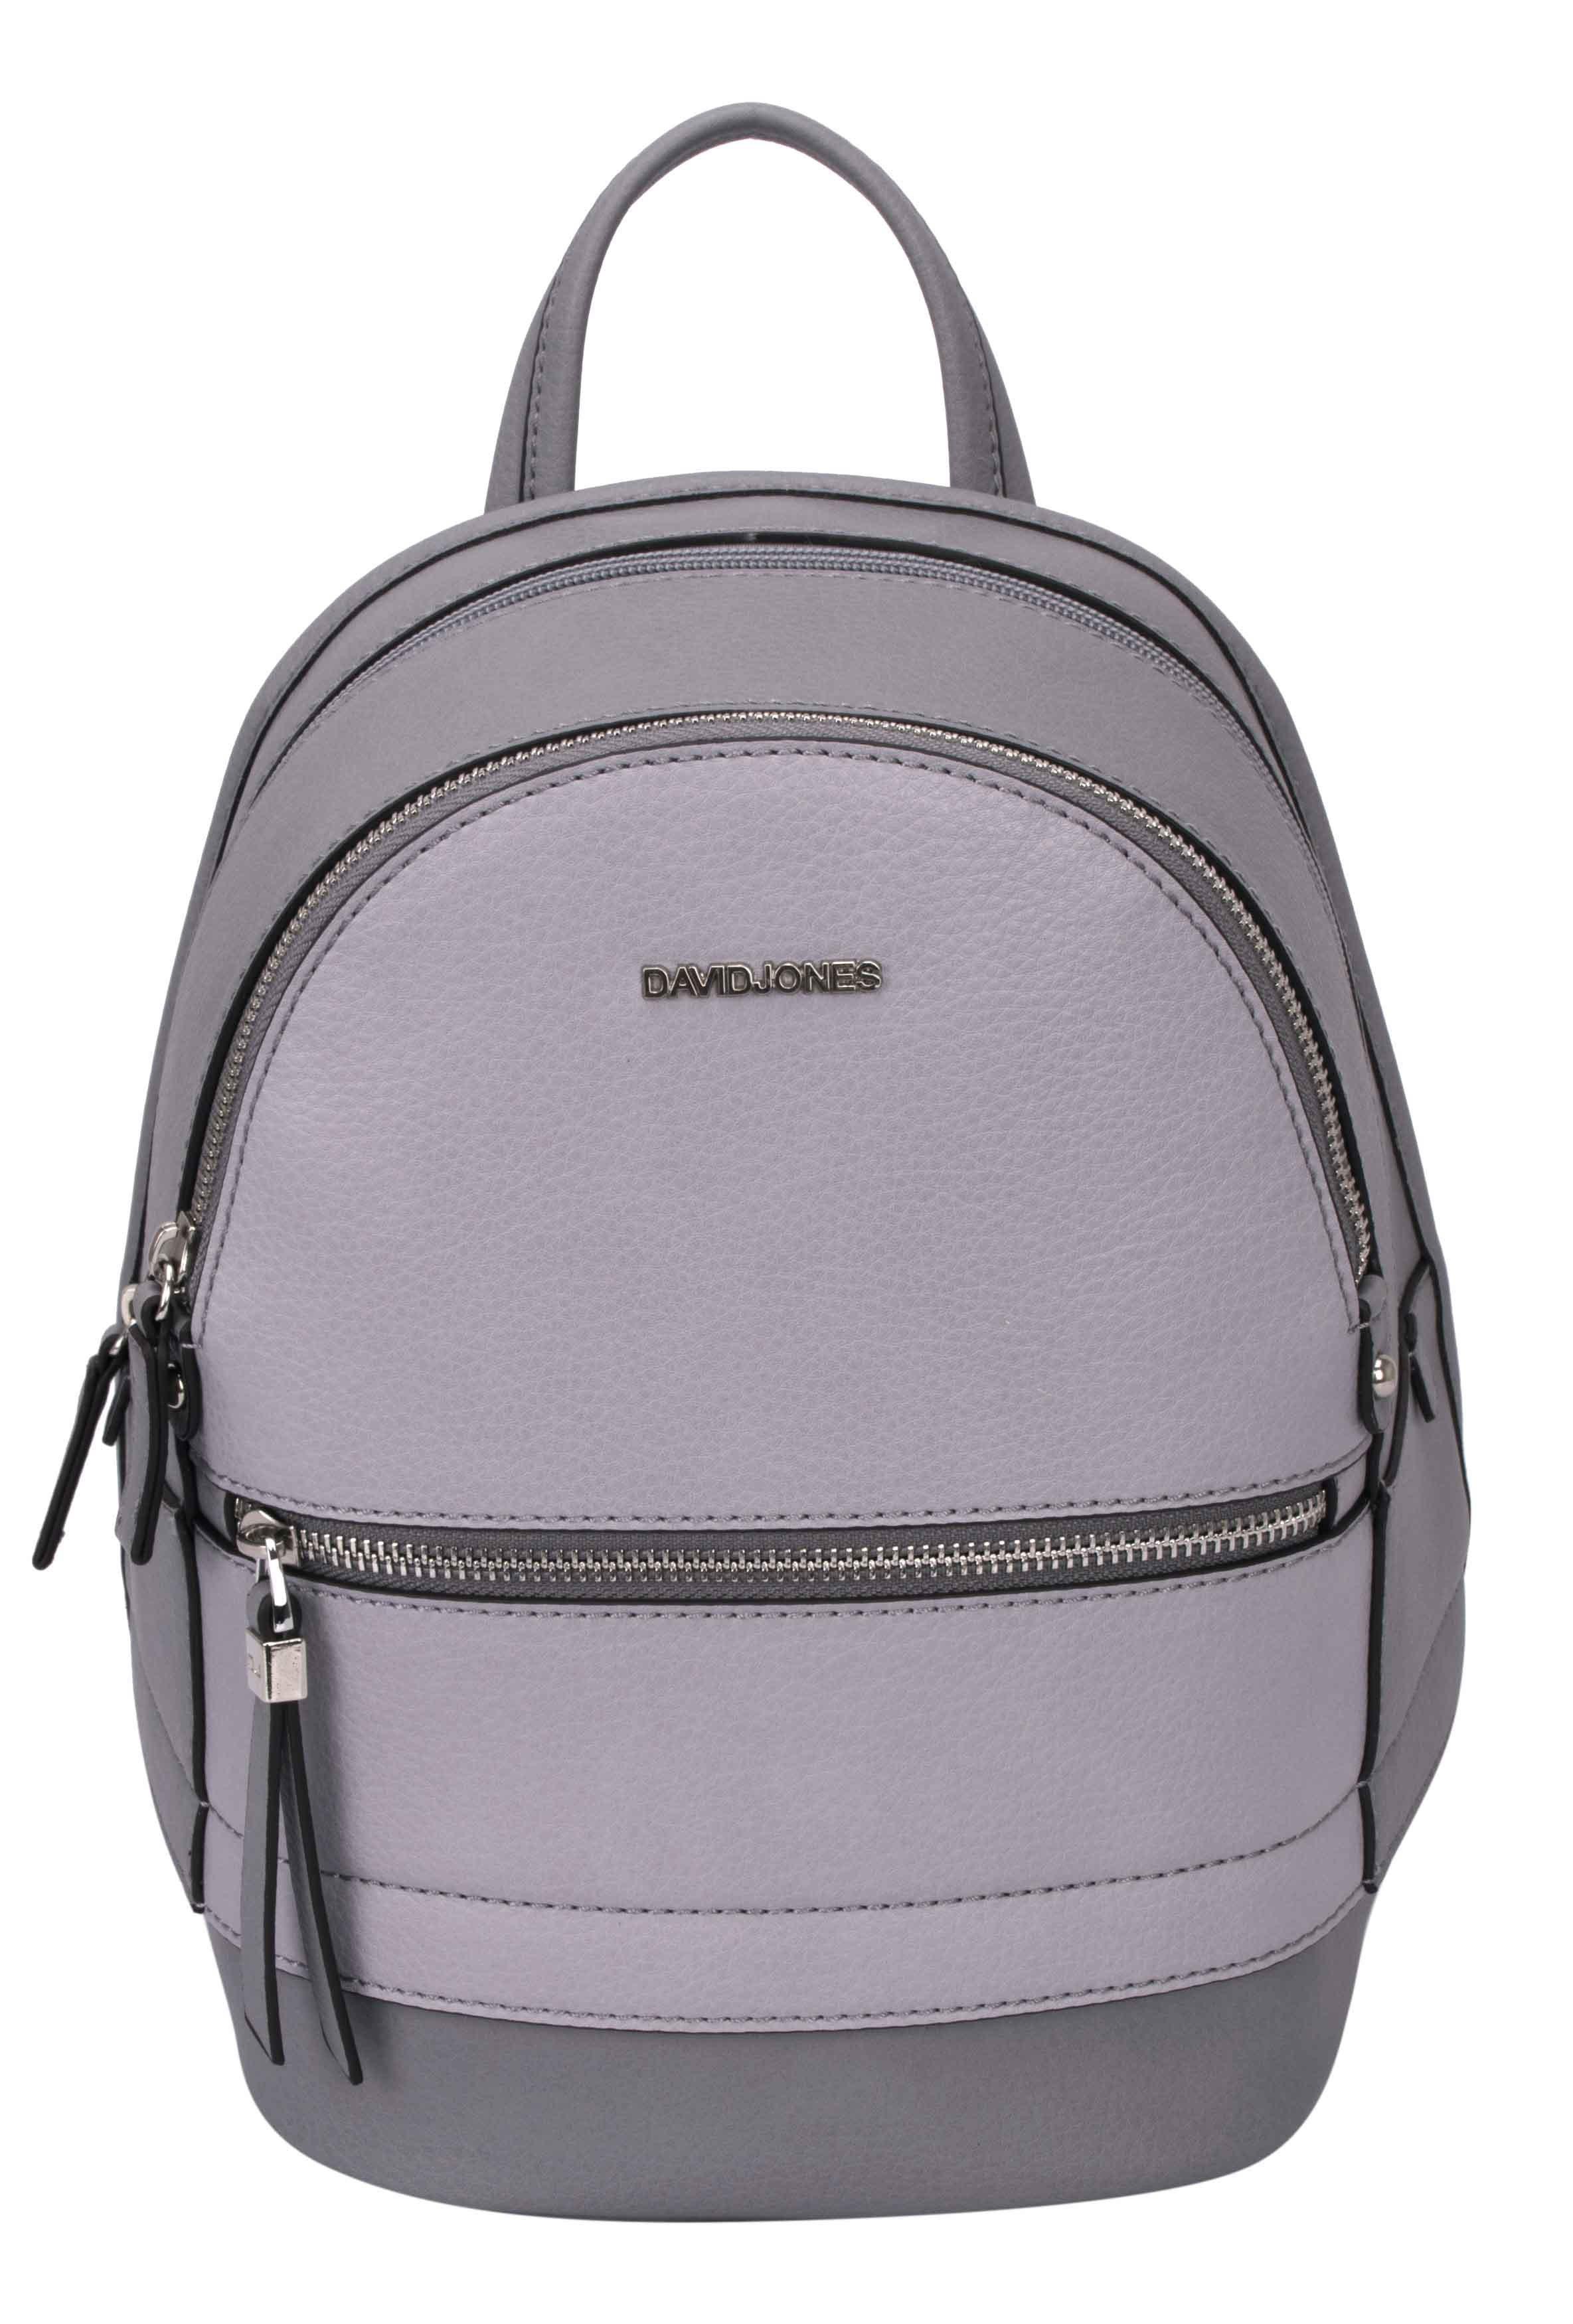 China New Girl School Bag Travel Cute Backpack Satchel Women Shoulder Rucksack - China Backpack, School Backpack